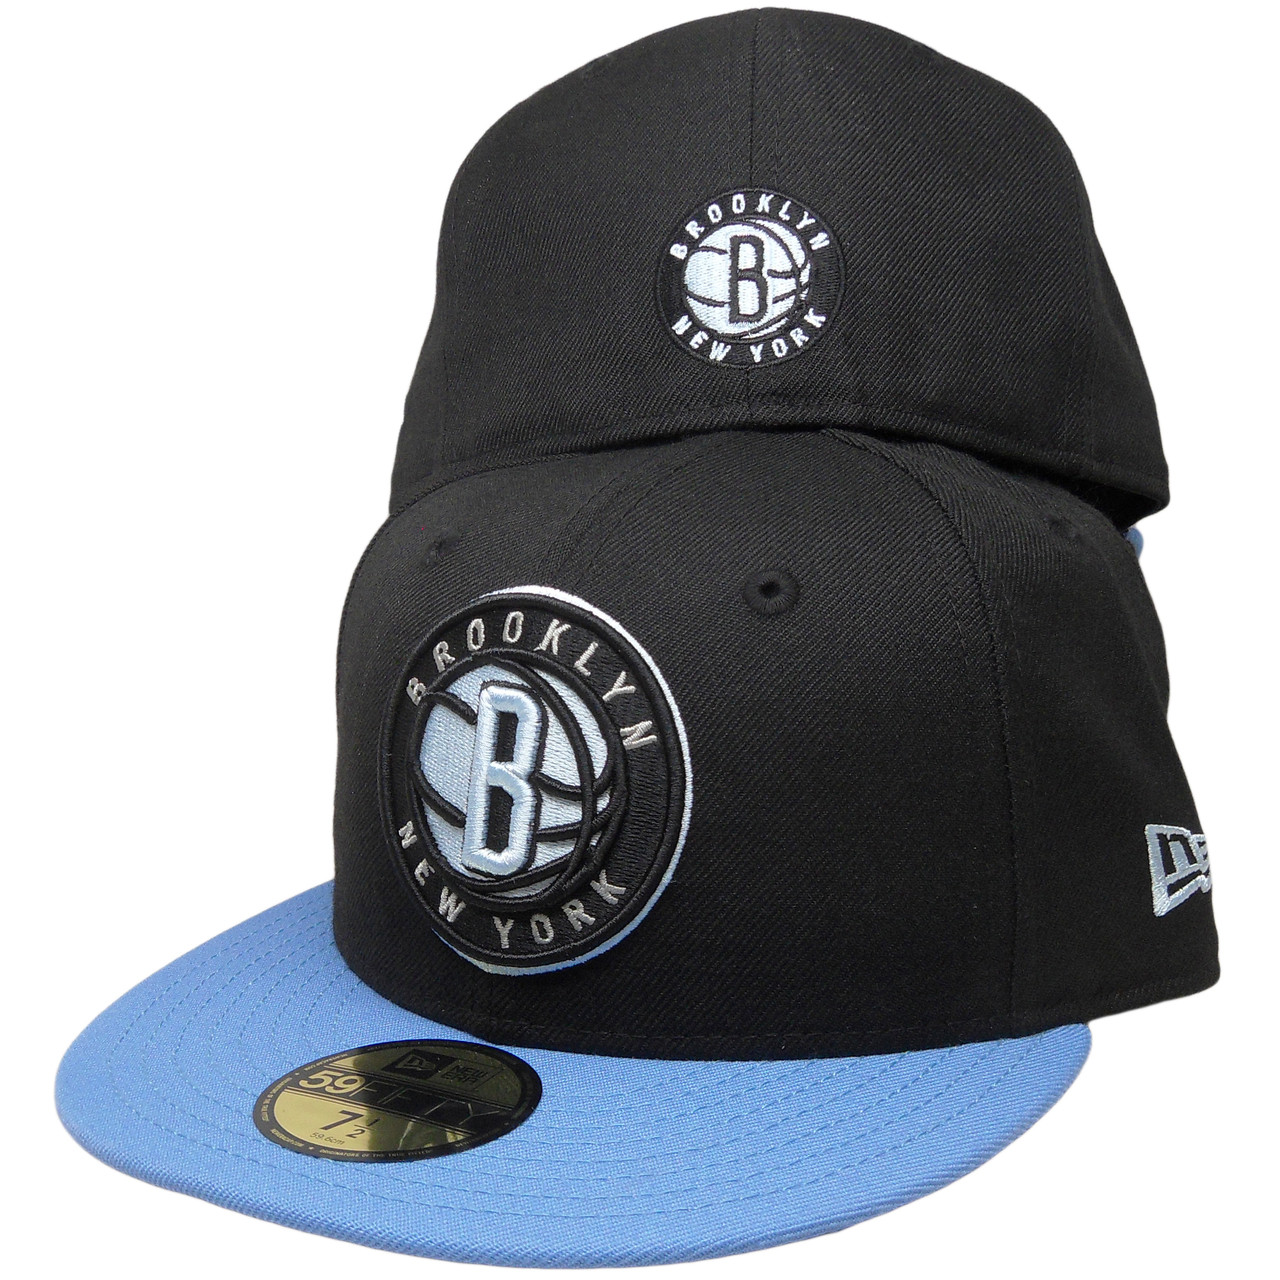 08e130657e76f Brooklyn Nets New Era Custom 59Fifty Fitted hat - Black